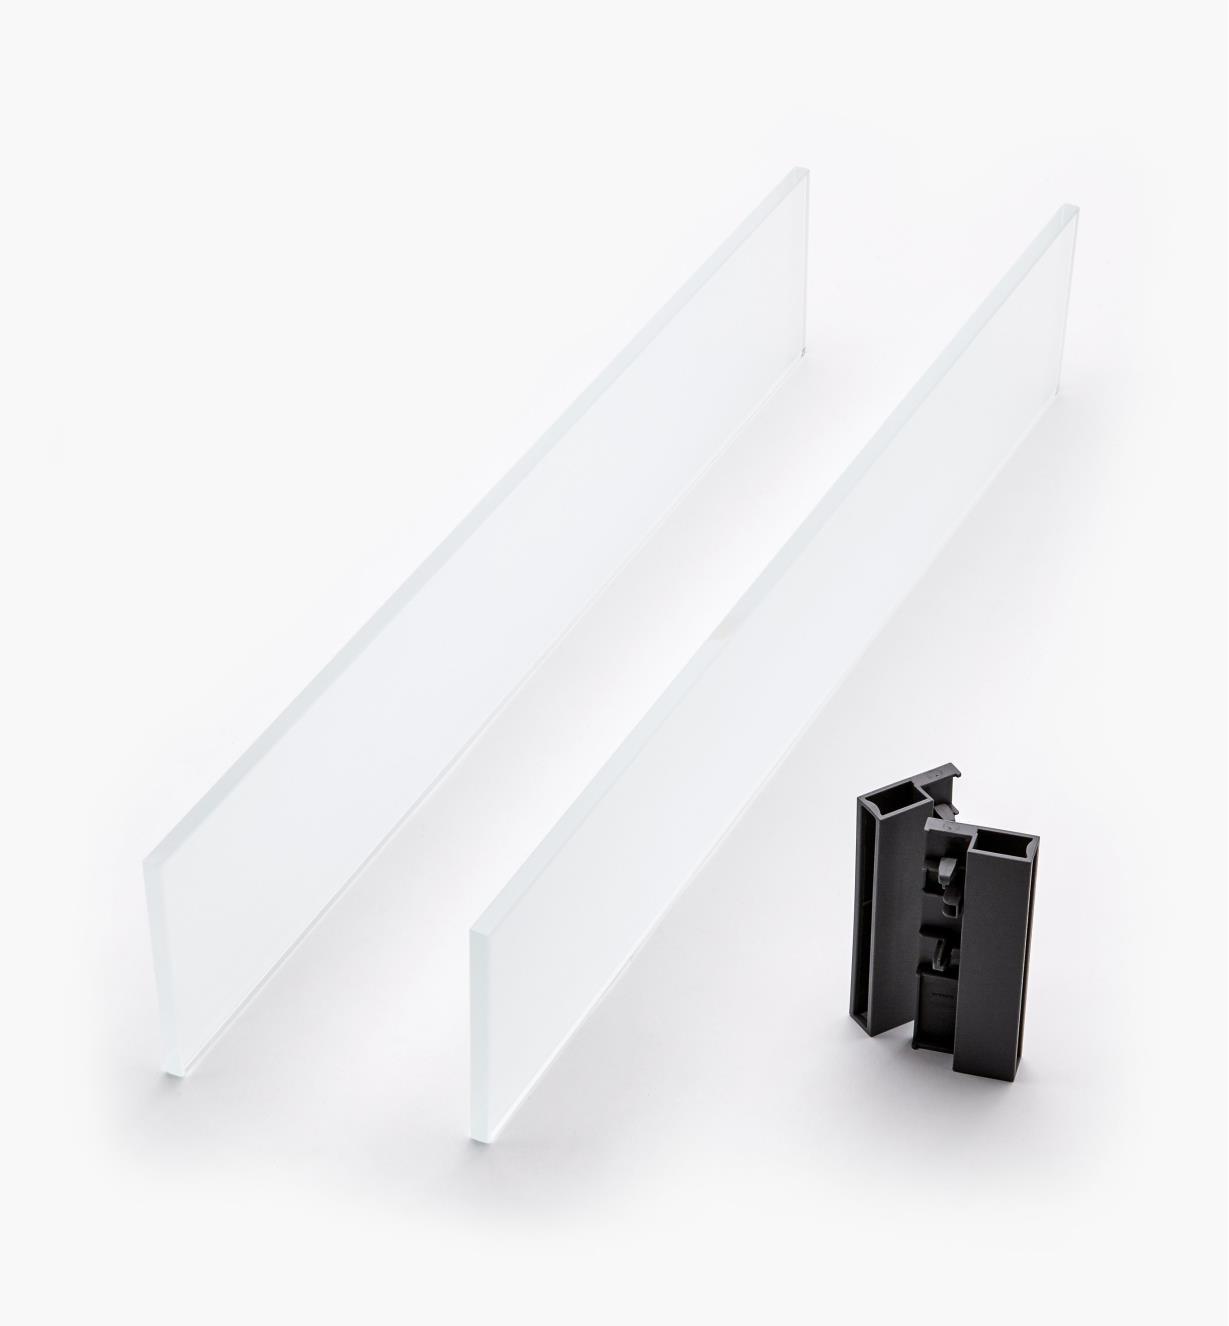 02K2856 - Glass Insert Panels for Blum Tandembox Antaro Soft-Close Type D 550mm Drawer Kit